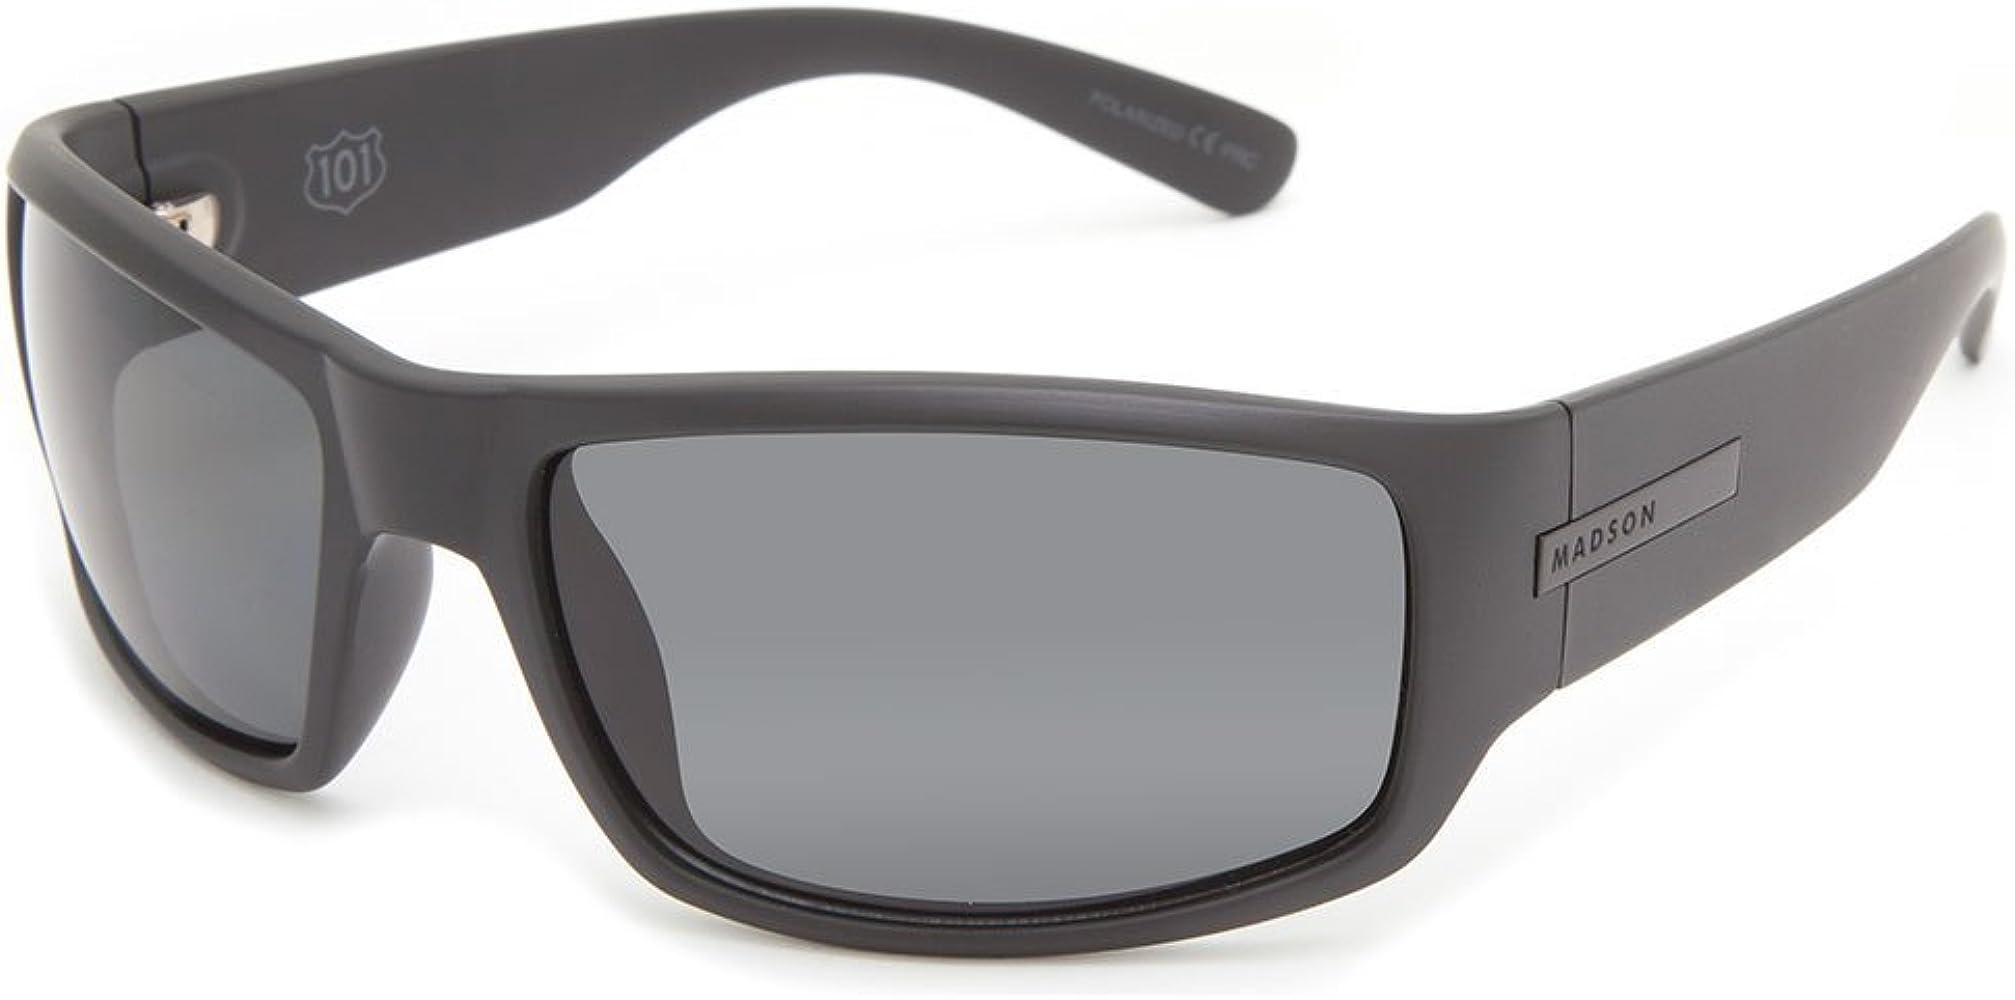 5b78e9a5245c9 101 Polarized Sunglasses. MADSON Unisex 2923006 Polarised